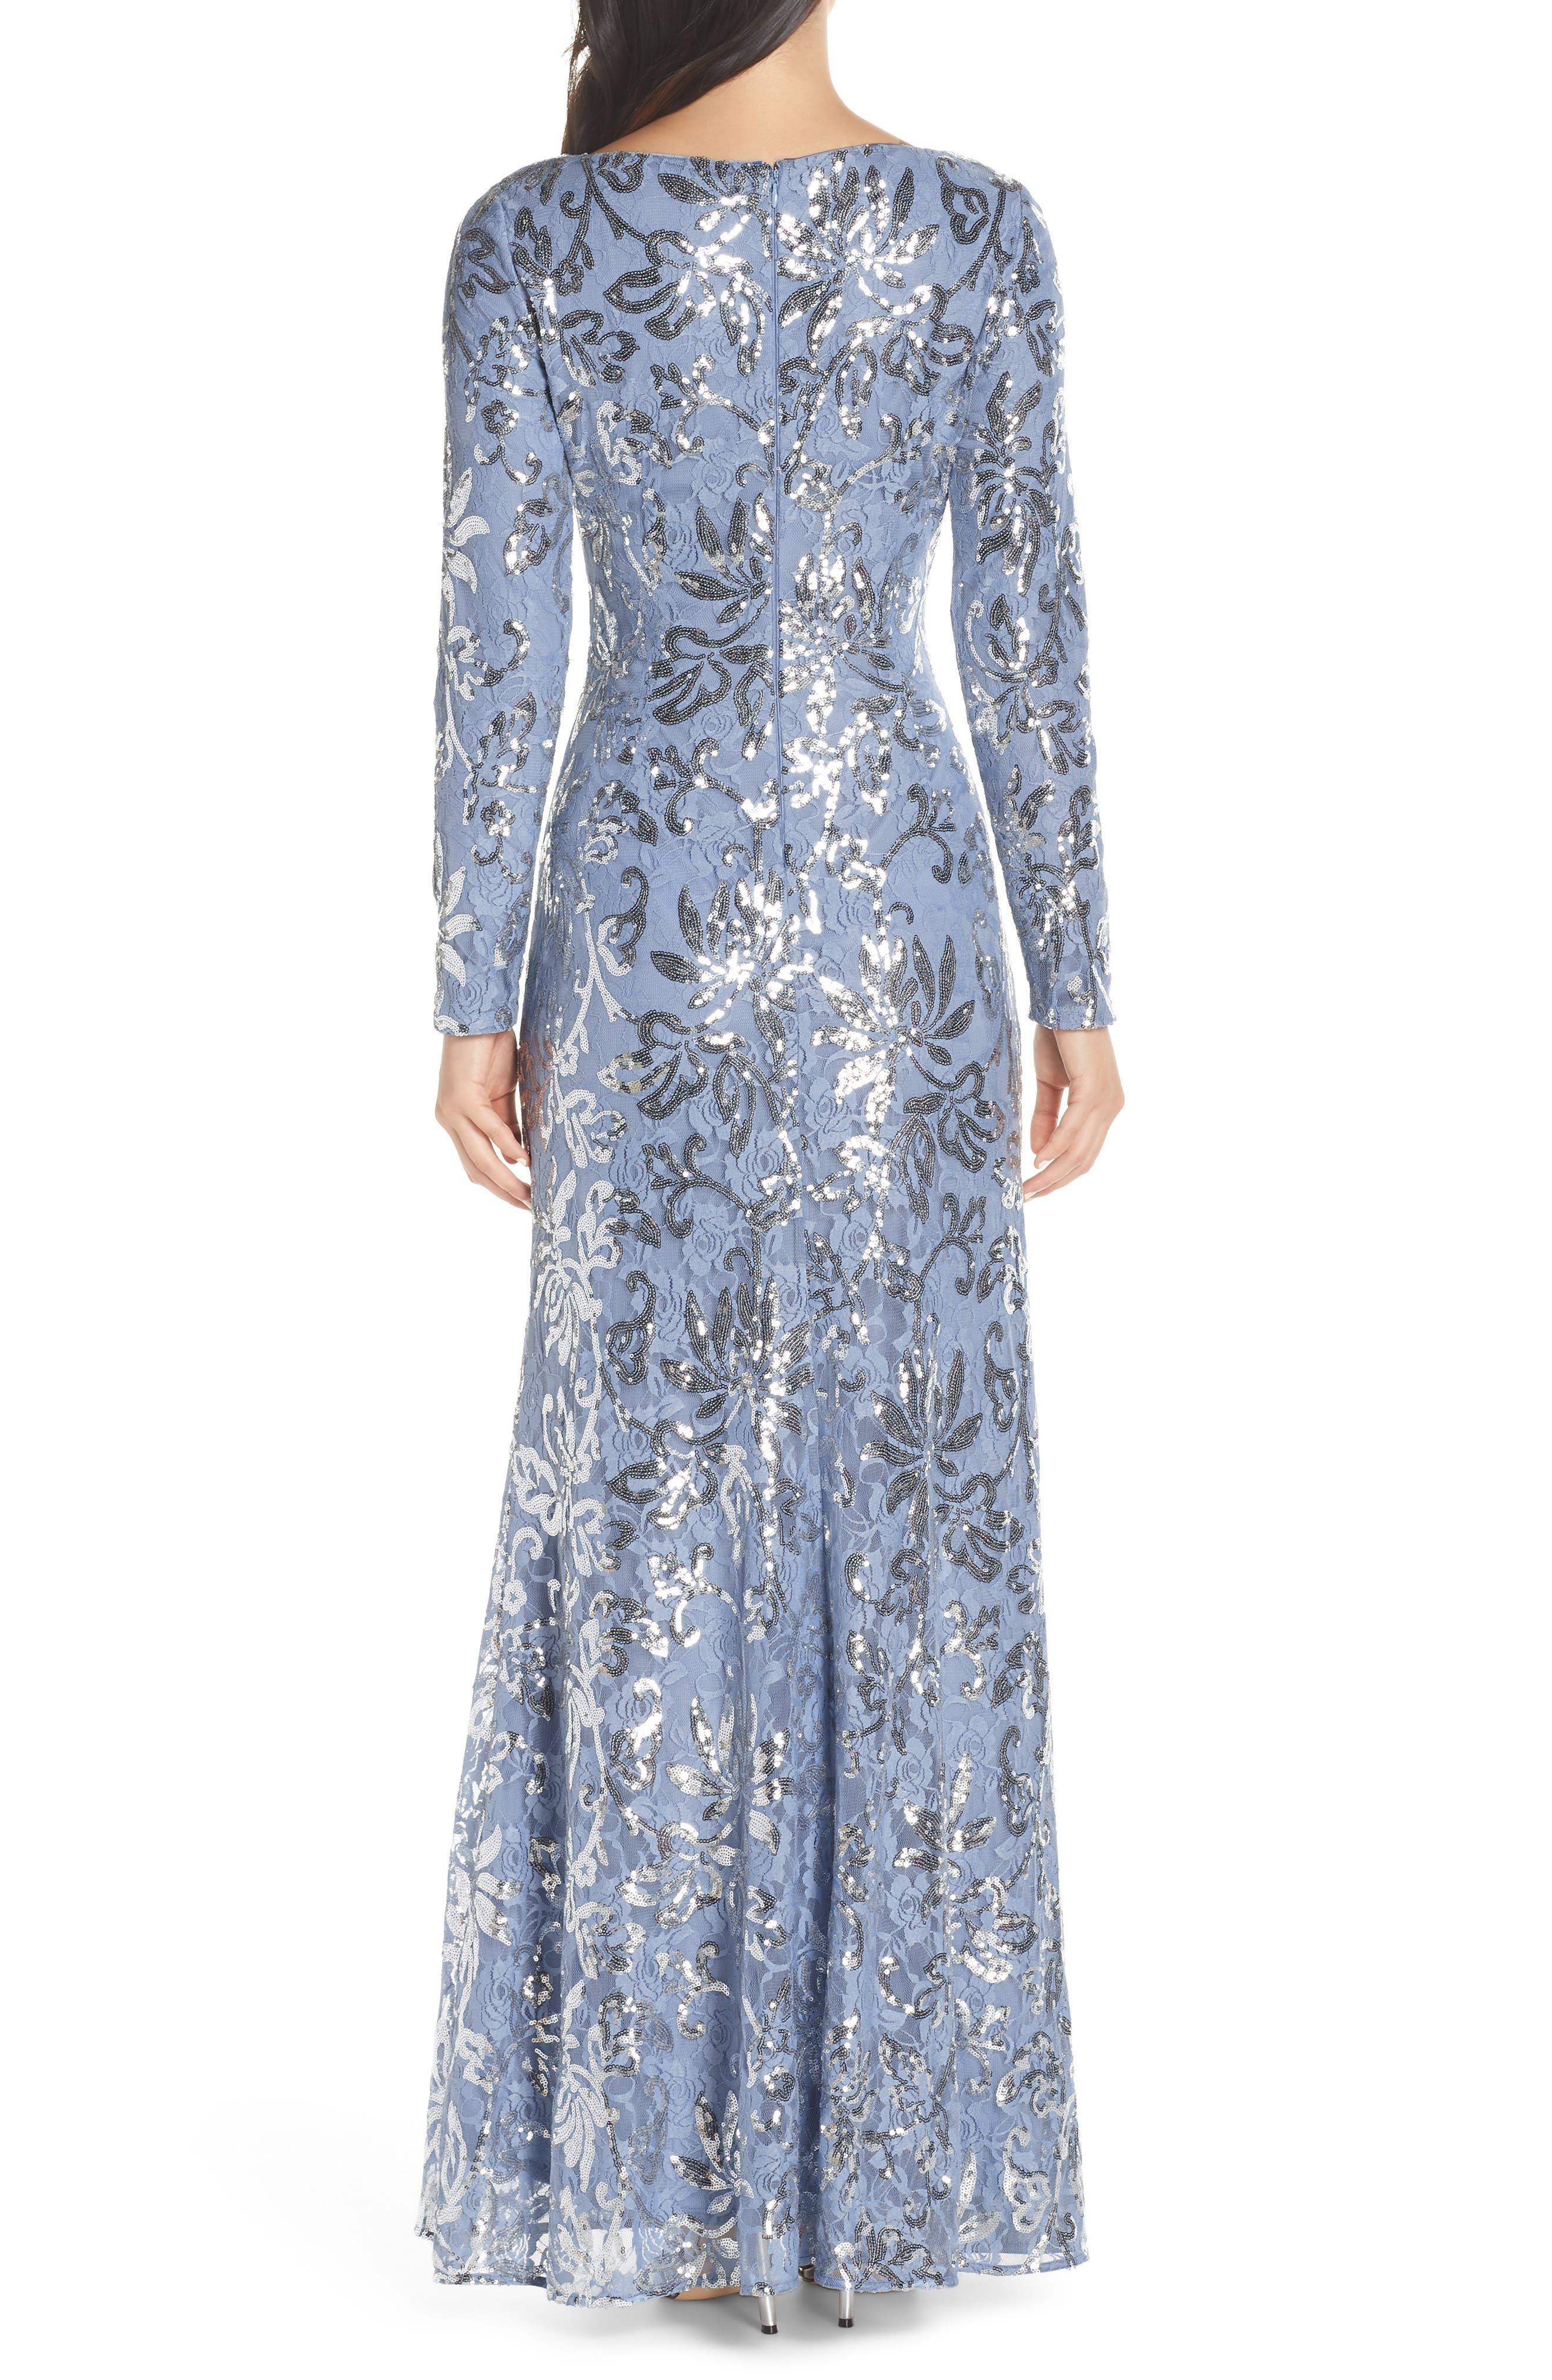 VINCE CAMUTO, Lace & Sequin Evening Dress, Alternate thumbnail 2, color, SKY BLUE